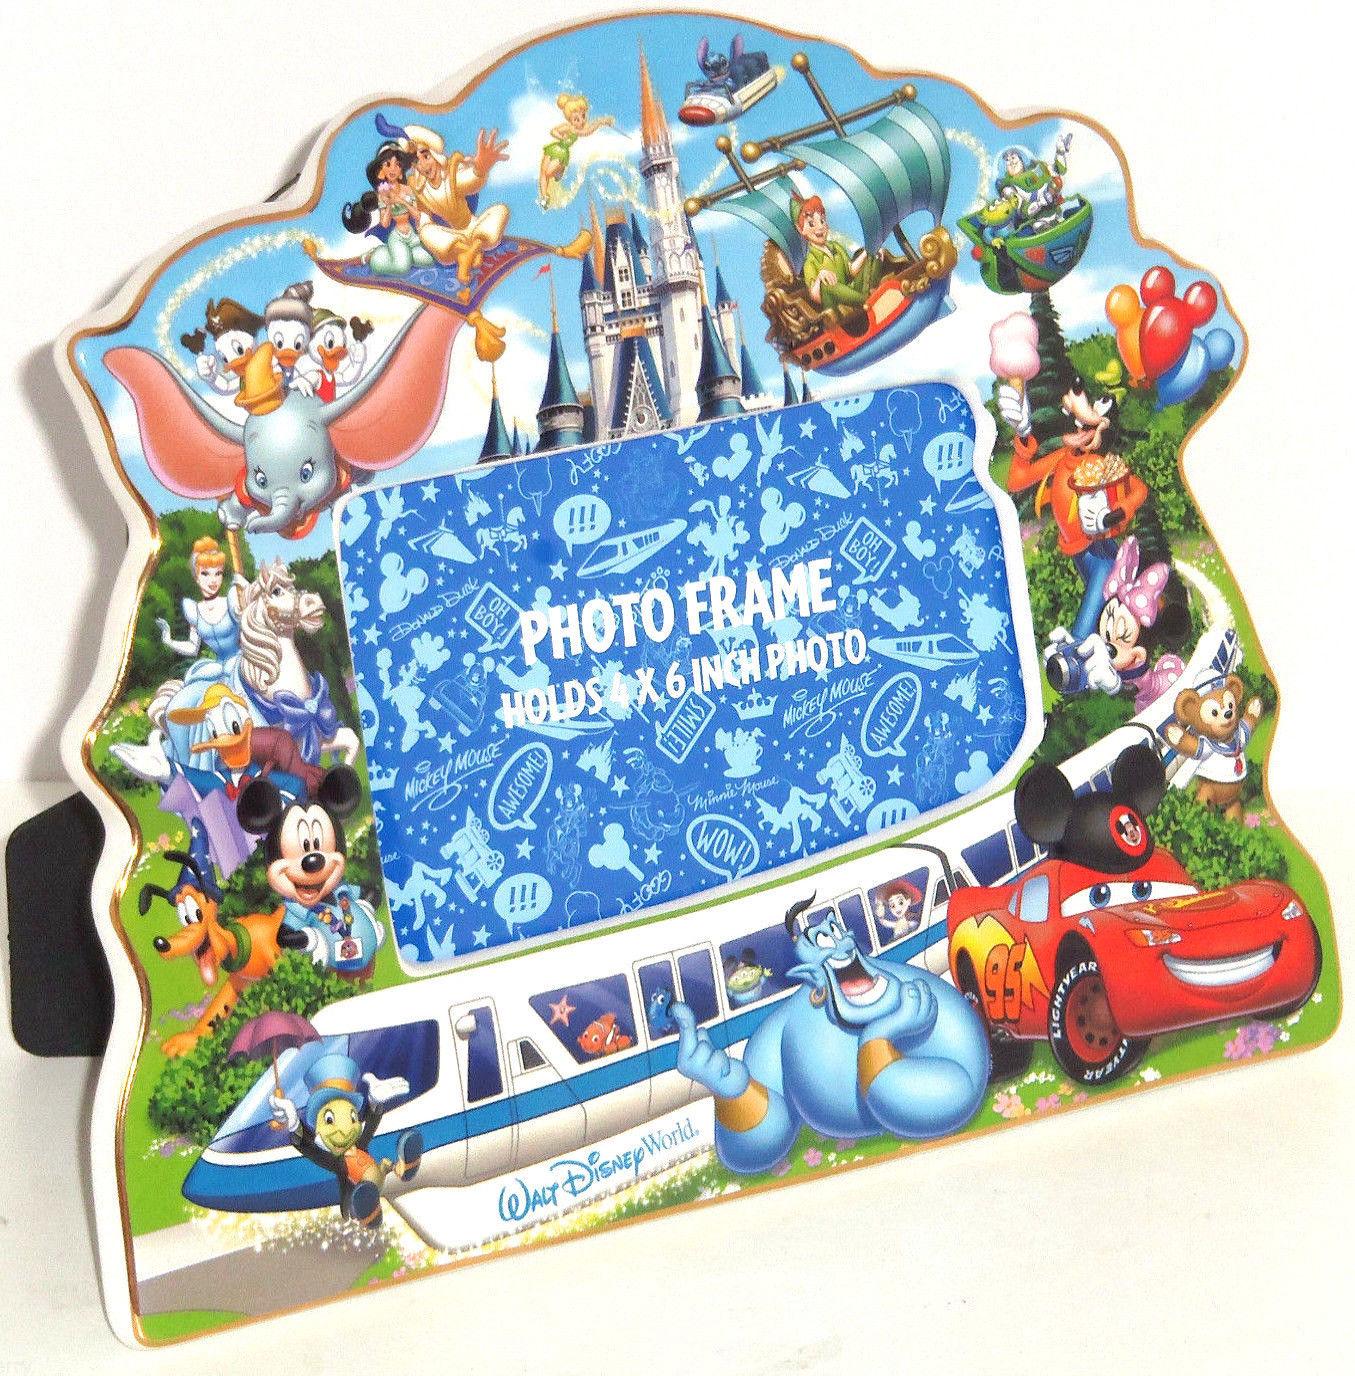 Walt Disney World Storybook Photo Frame and 17 similar items